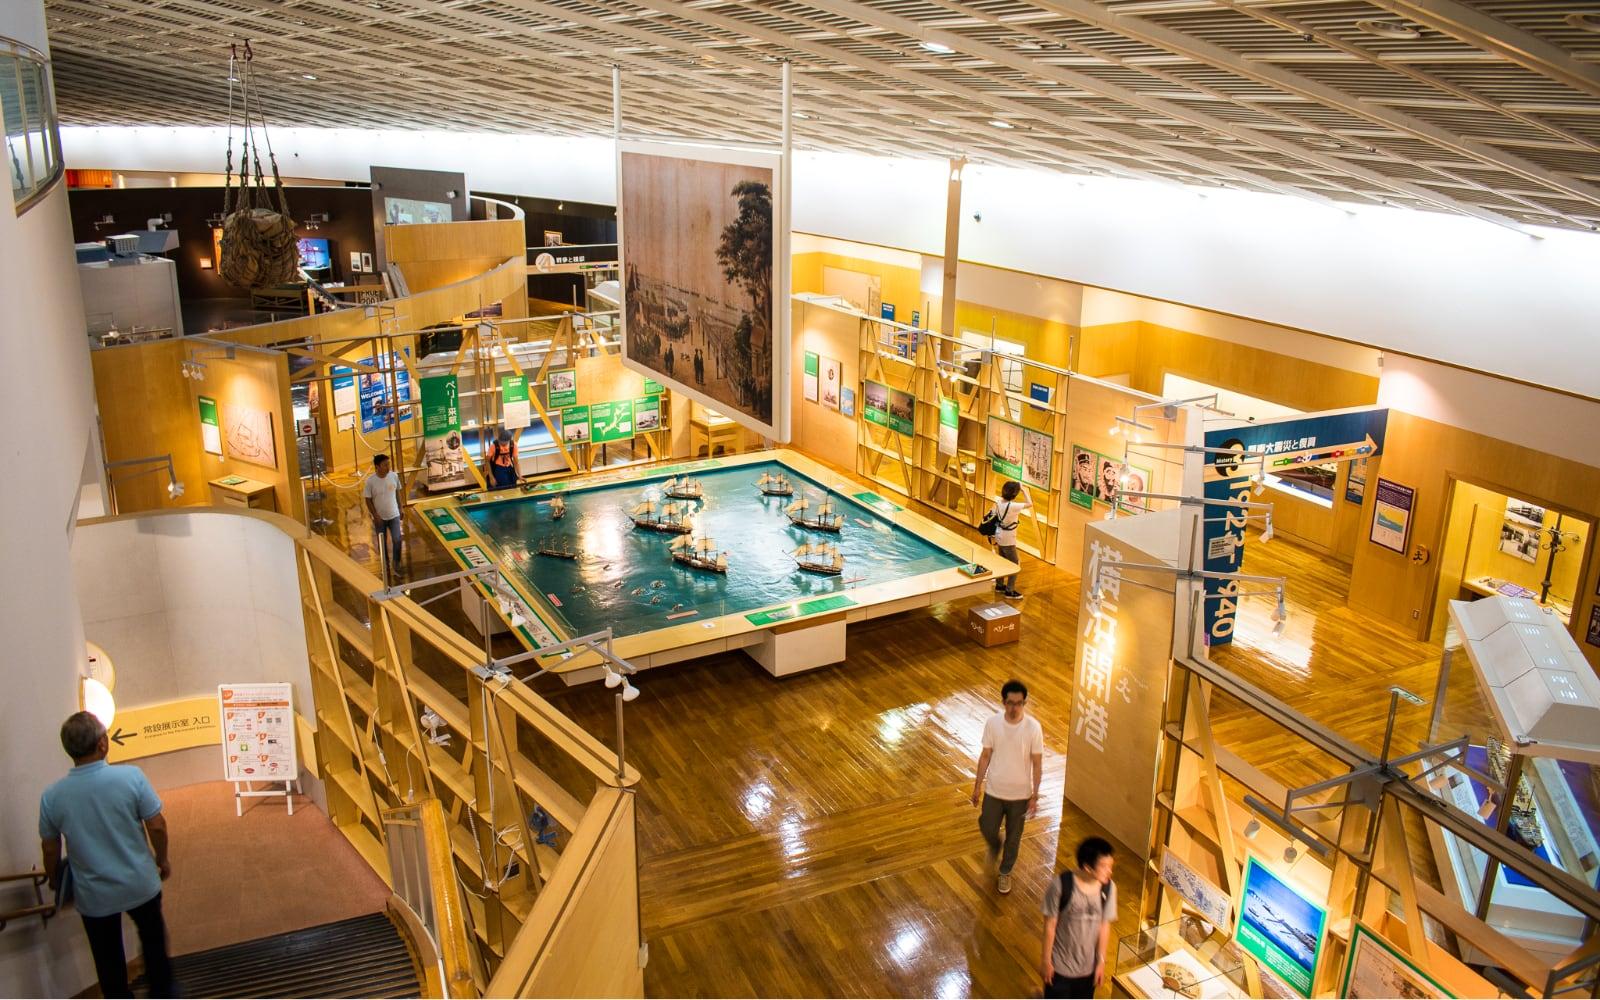 Museum Yokohama Nippon Maru: A Must Add to your Yokohama Itinerary